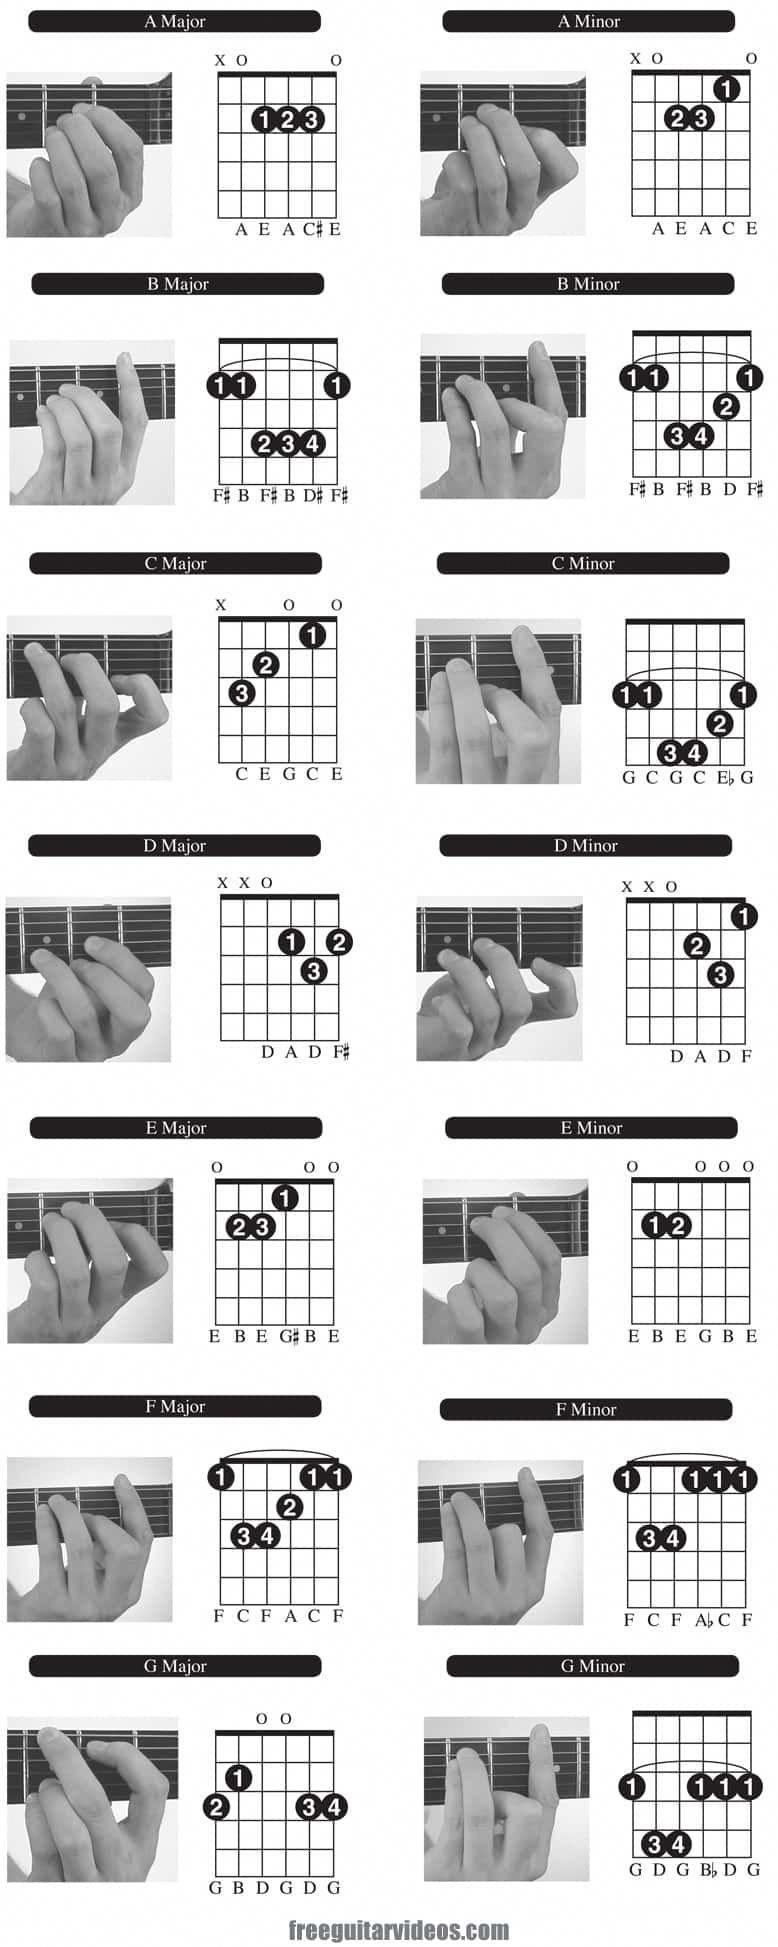 Learn The Guitar 0254 Learntheguitar Guitar Chords Beginner Guitar Chord Chart Guitar Chords How to read guitar chords for beginners